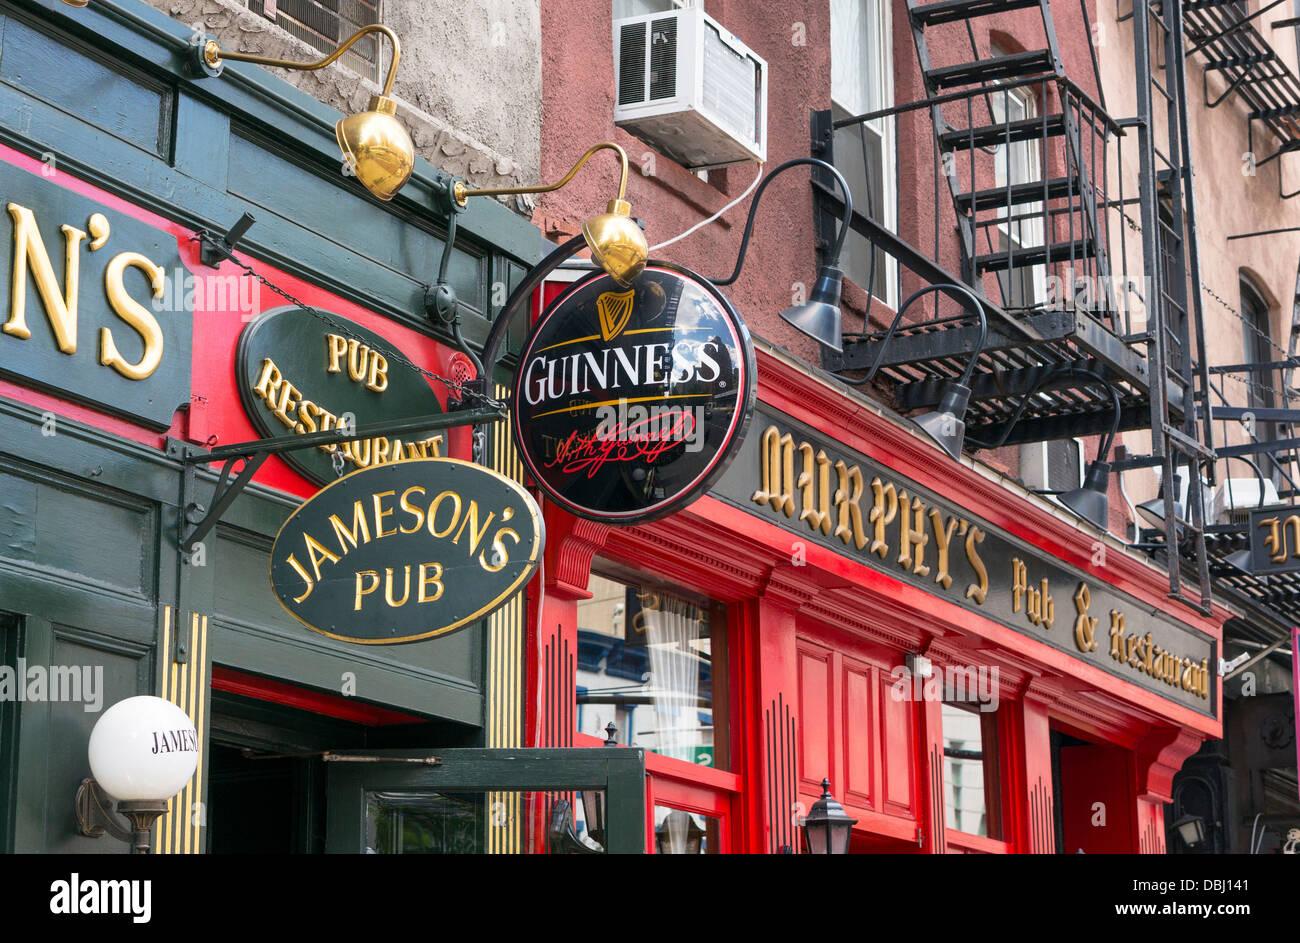 Irish dating in new york city